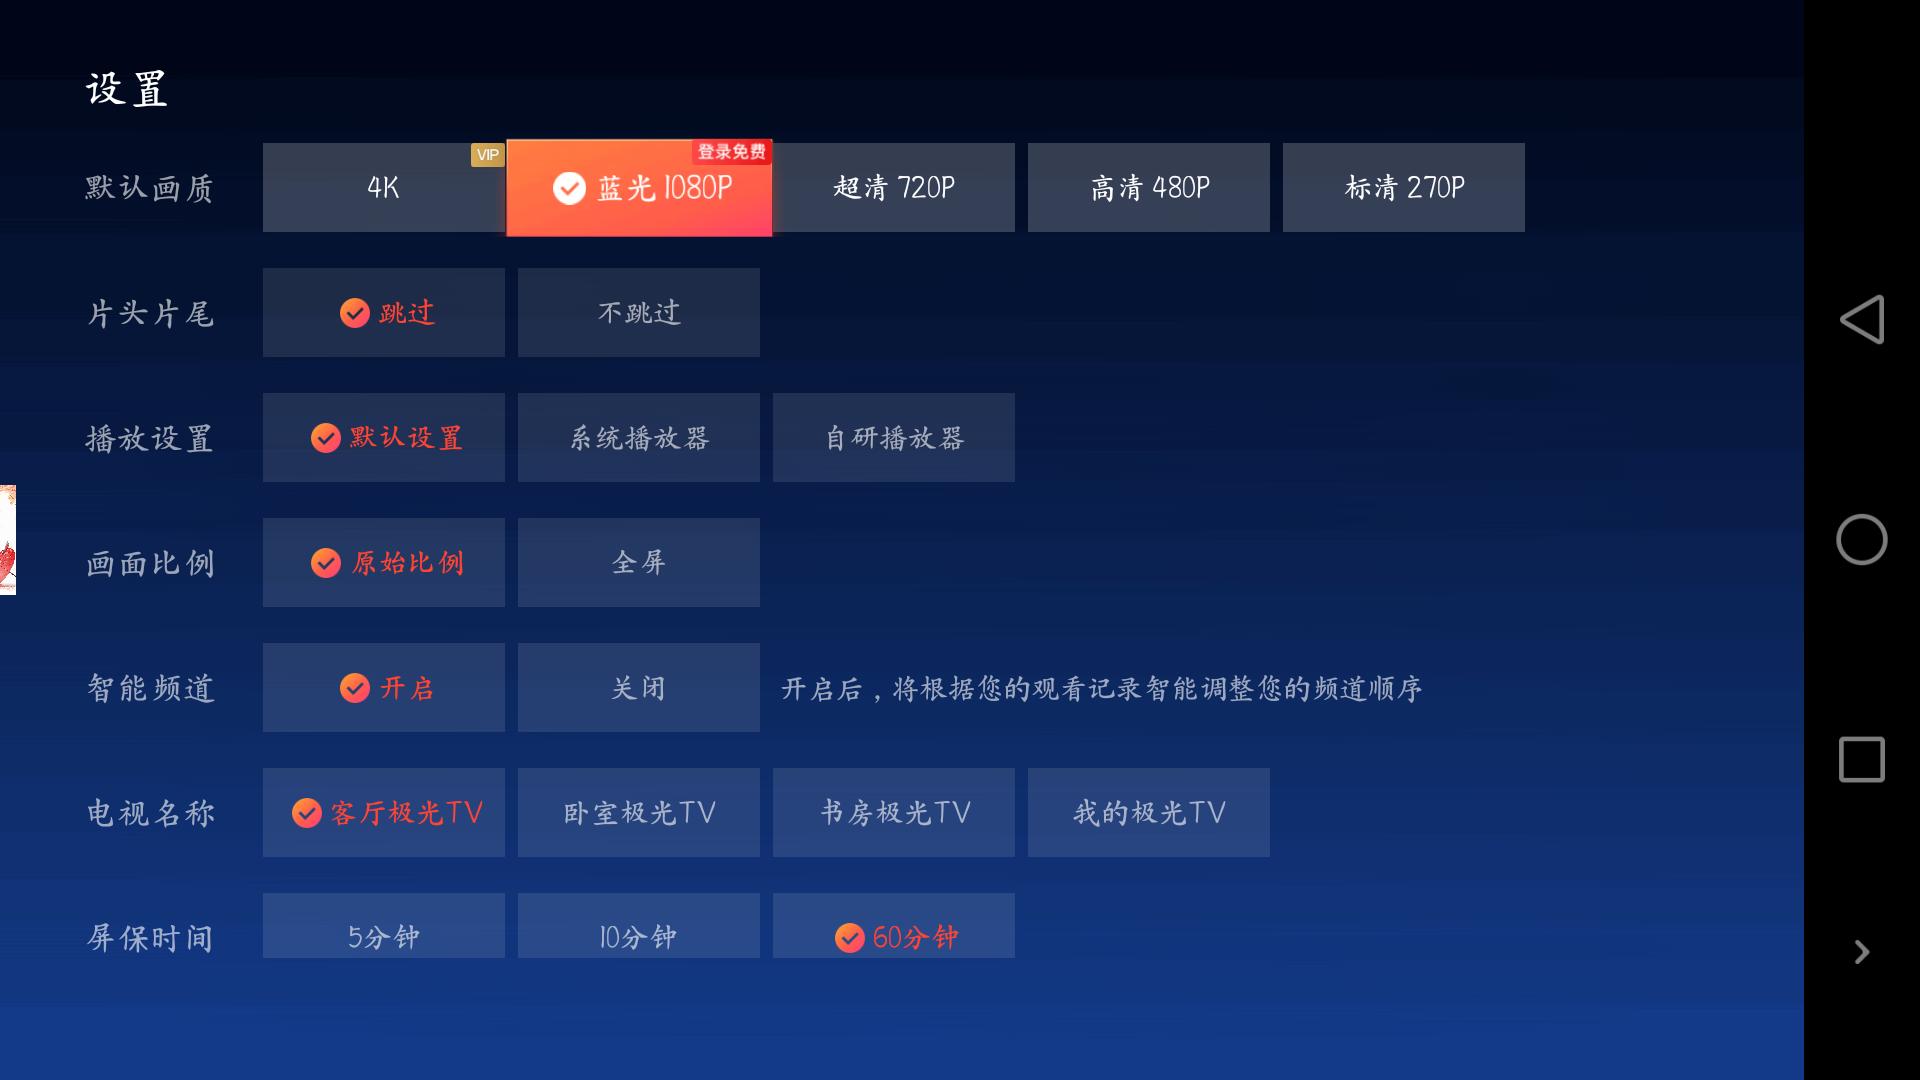 【X.千羽原创】云视听极光(腾讯视频tv)4.9.0去广告版-爱小助